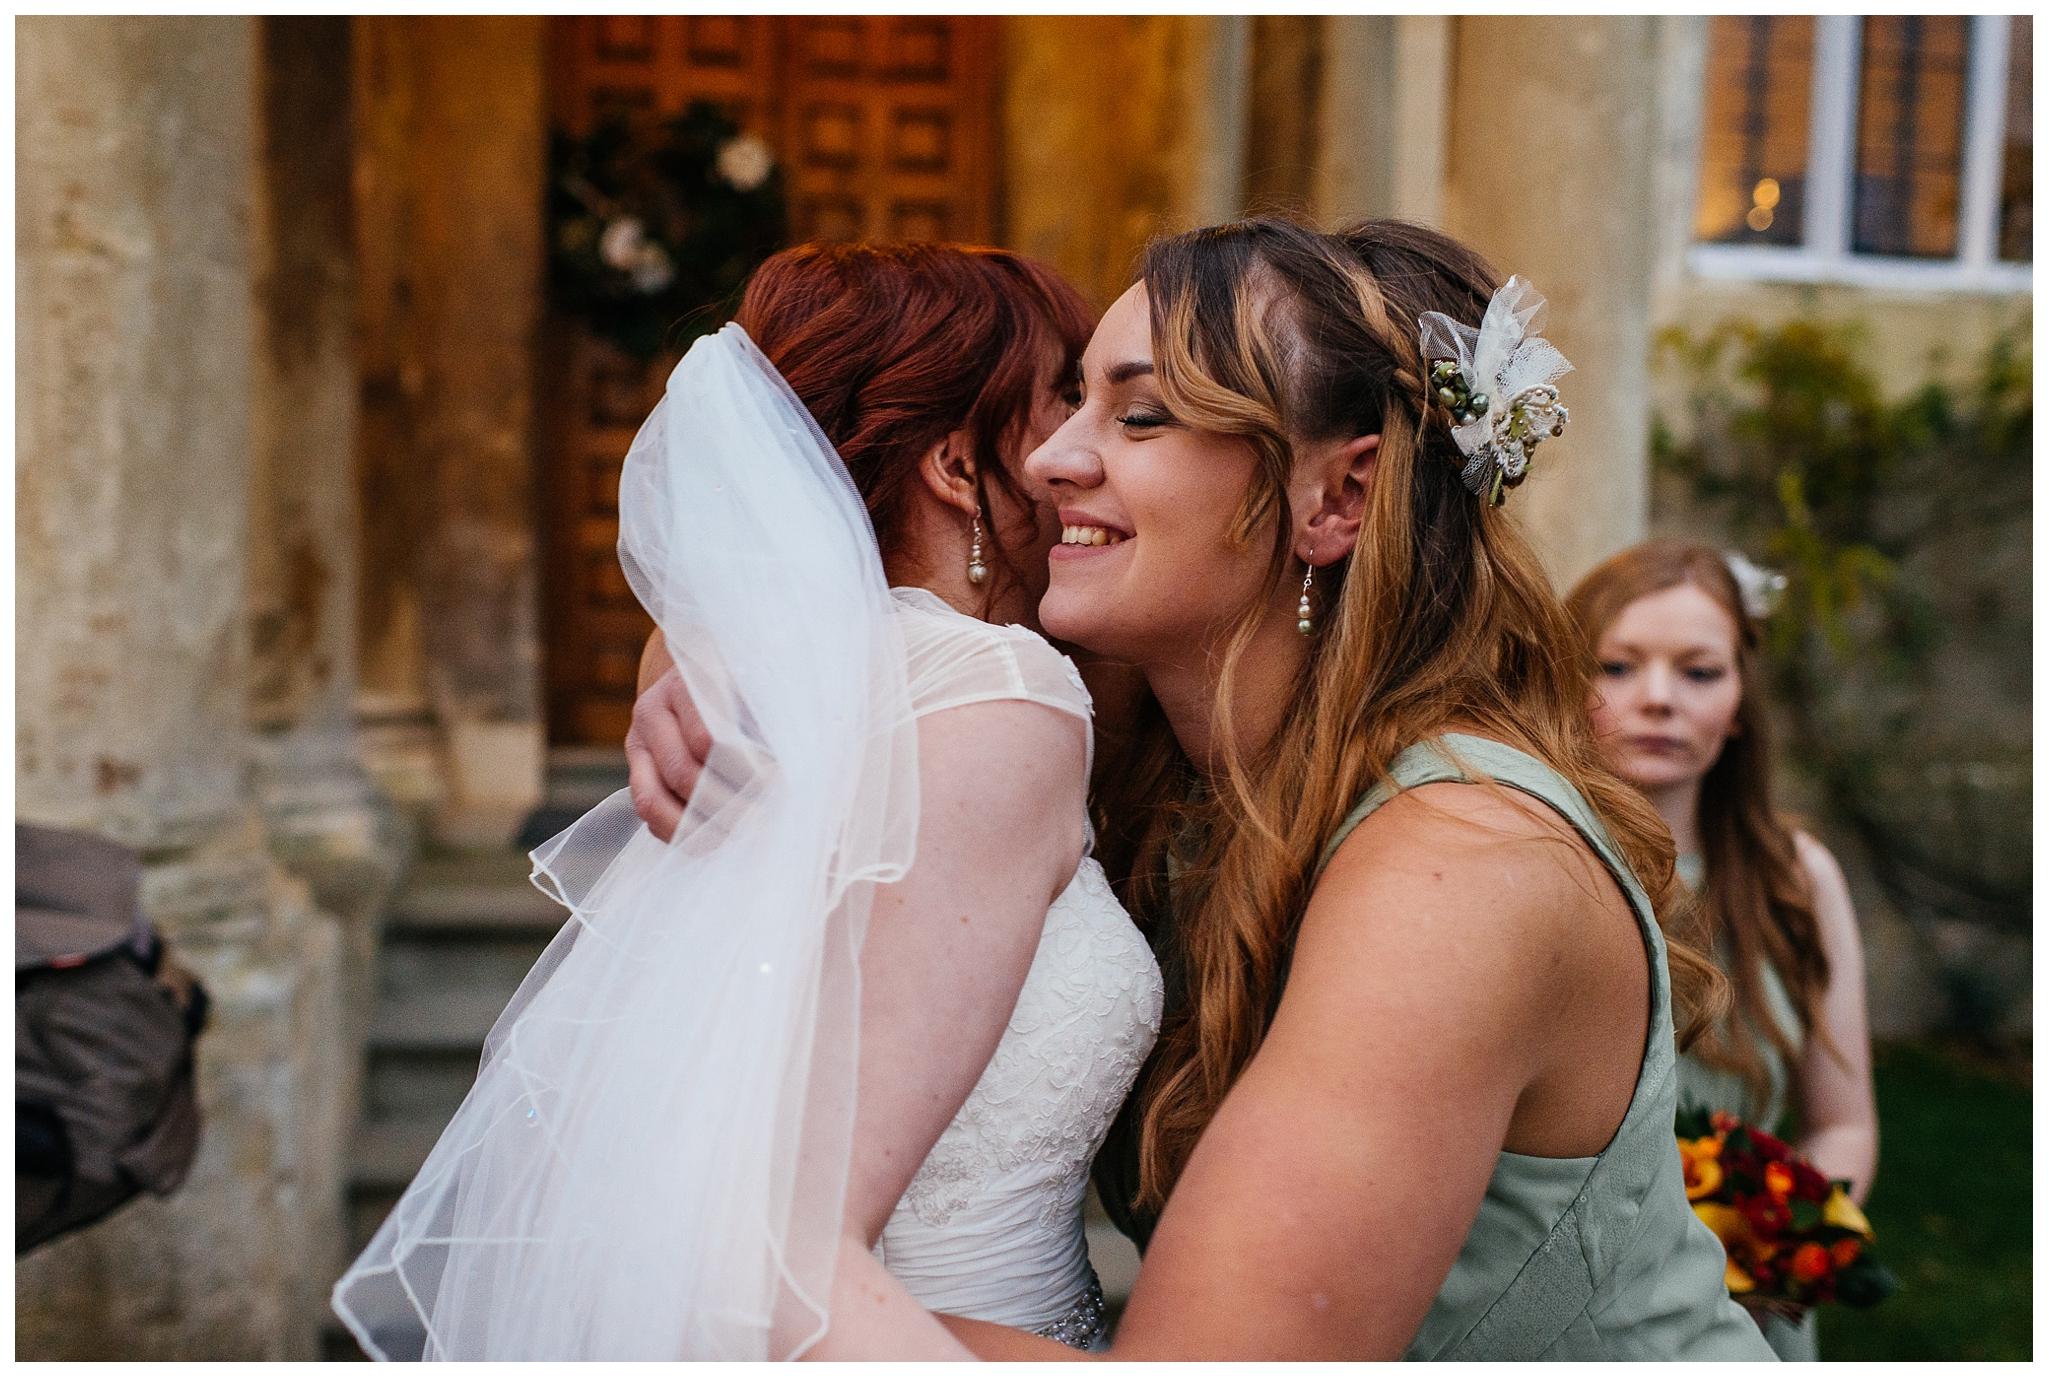 Emma&Paul-Elmore-Court-Winter-Wedding-Nikki-Cooper-Photography_0077.jpg